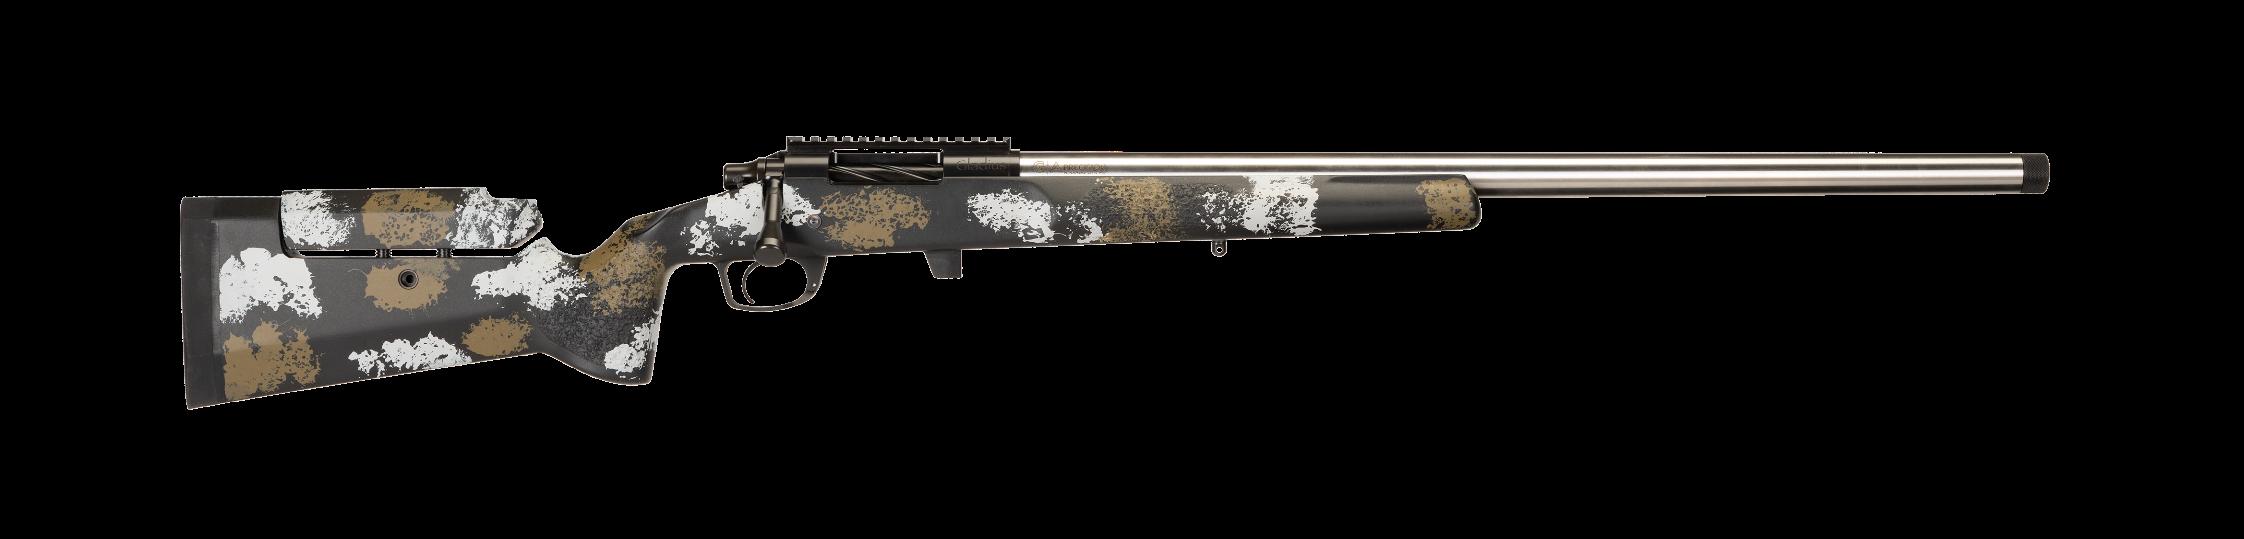 Pinnacle Production Rifle (PPR)